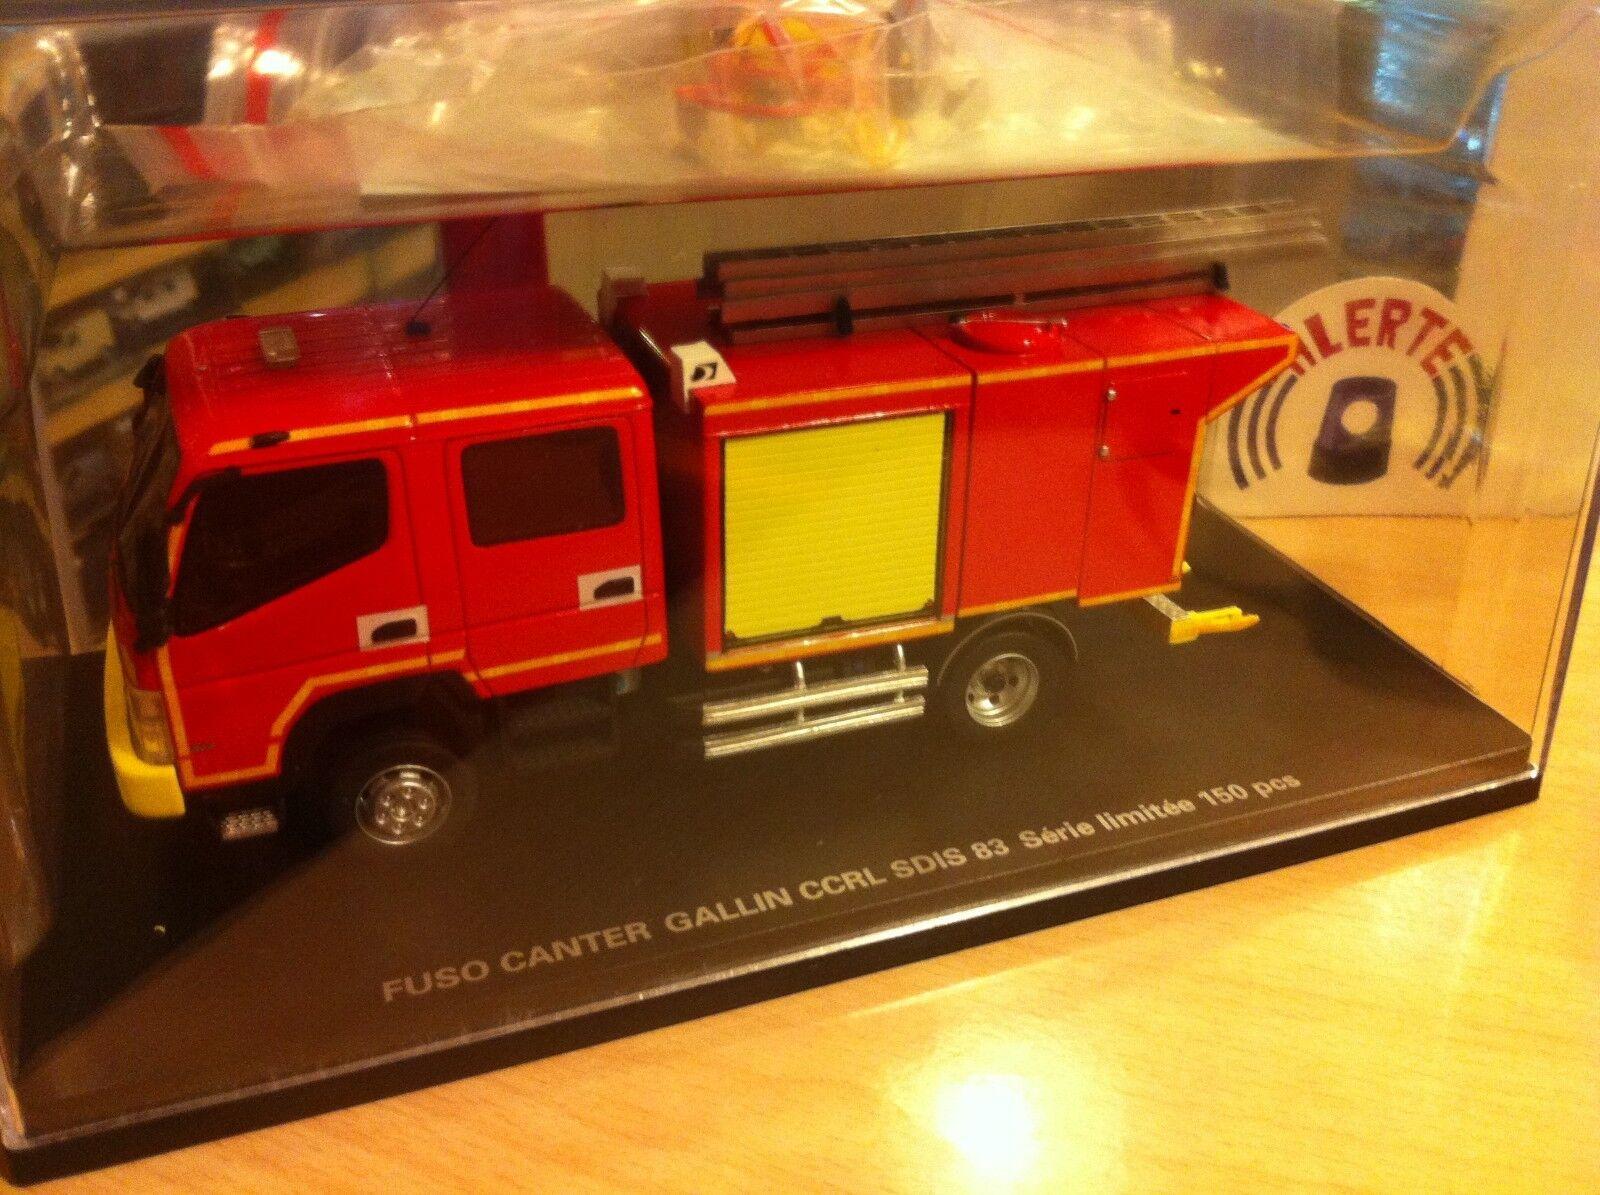 Fuso canter fire kindle ccrl sdis 83 1 43 perfex 0067c promo